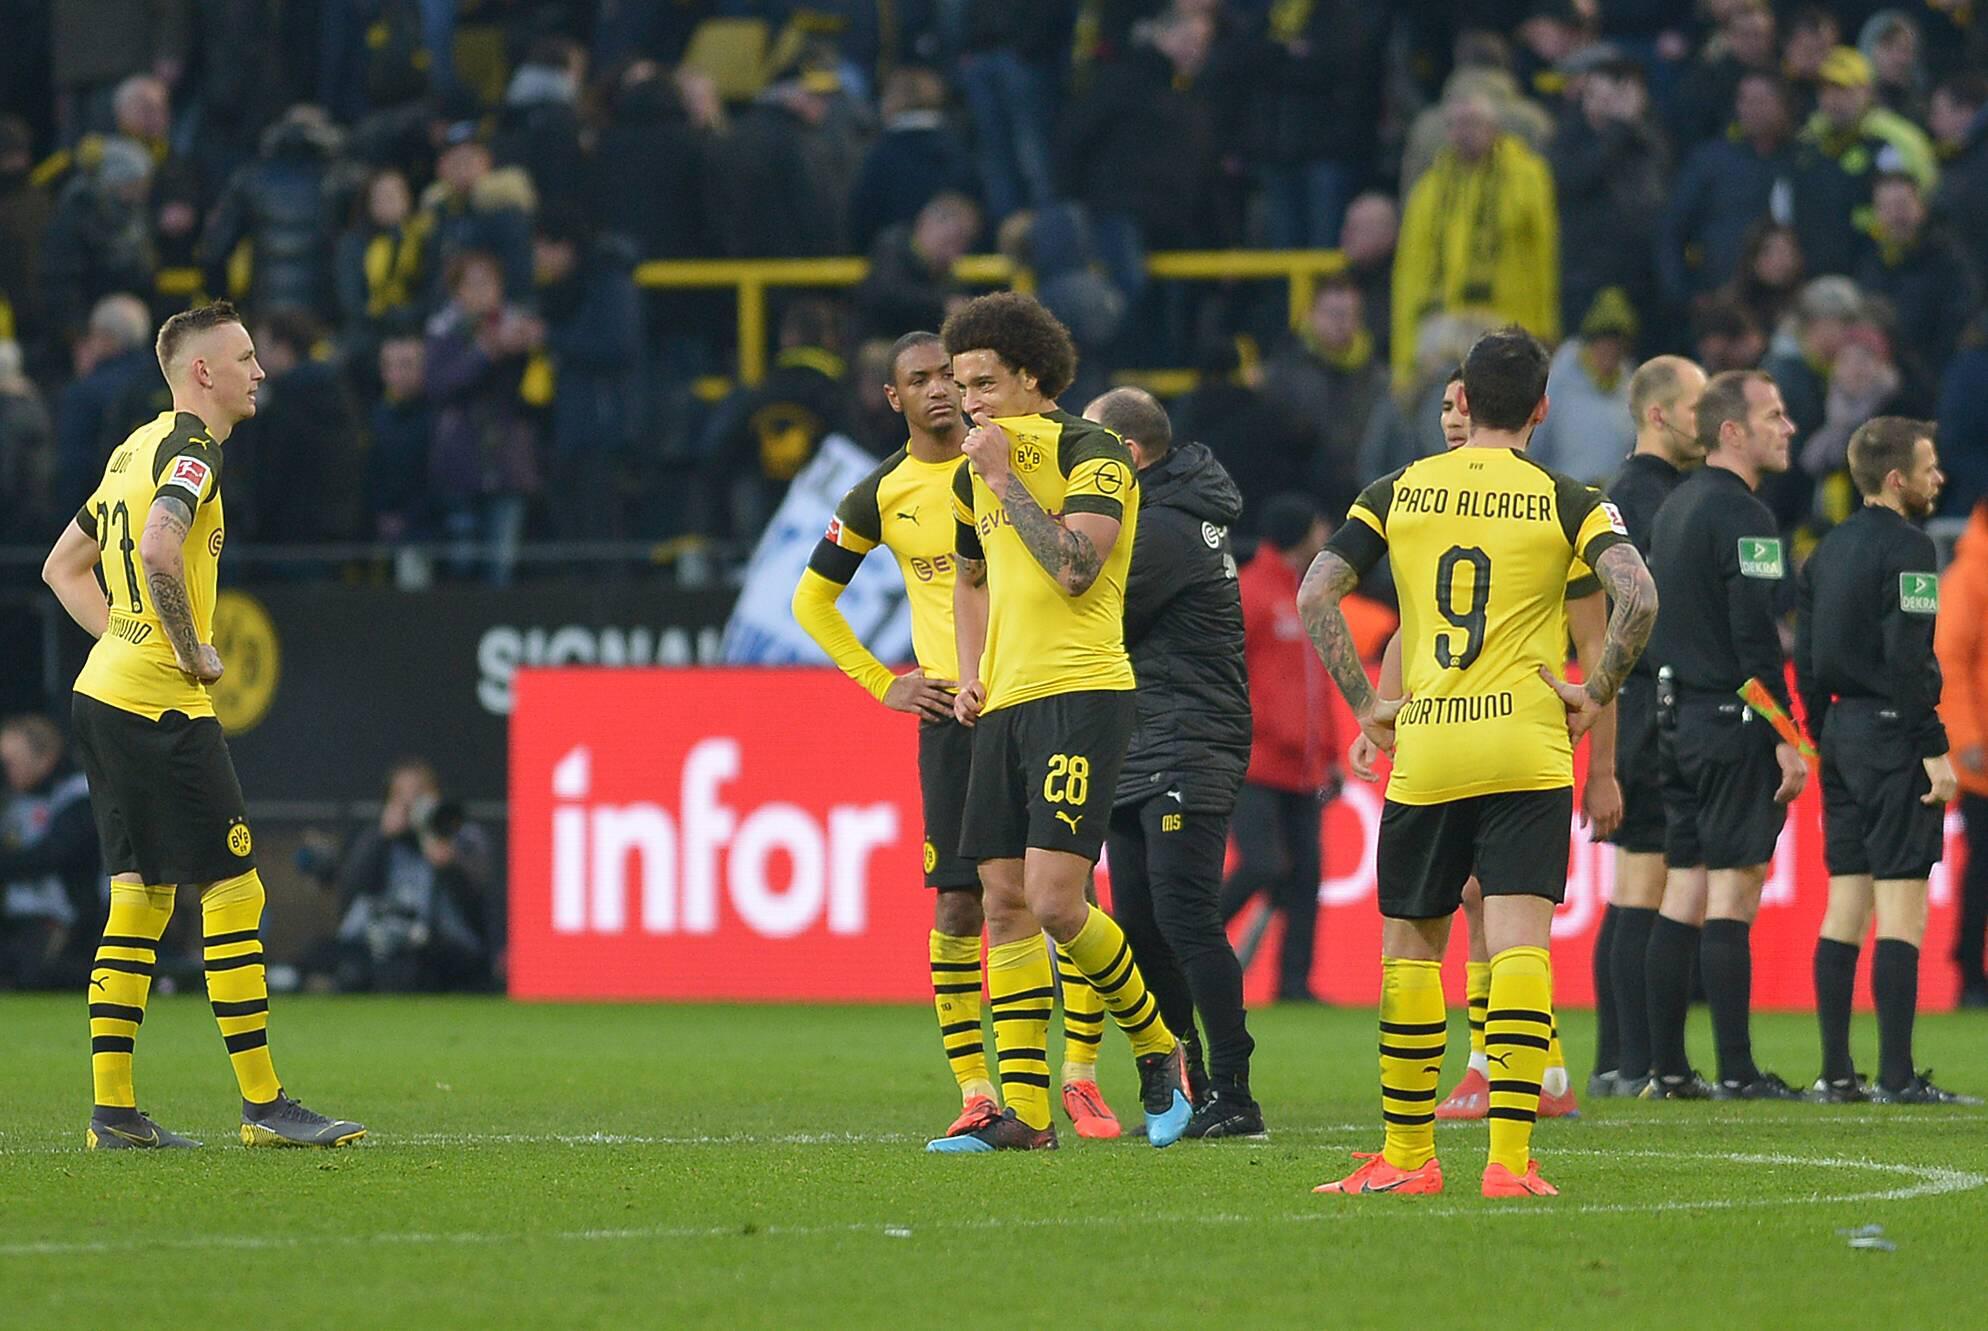 Bild zu Fussball, Bundesliga, BVB, Dortmund, Borussia, Hoffenheim